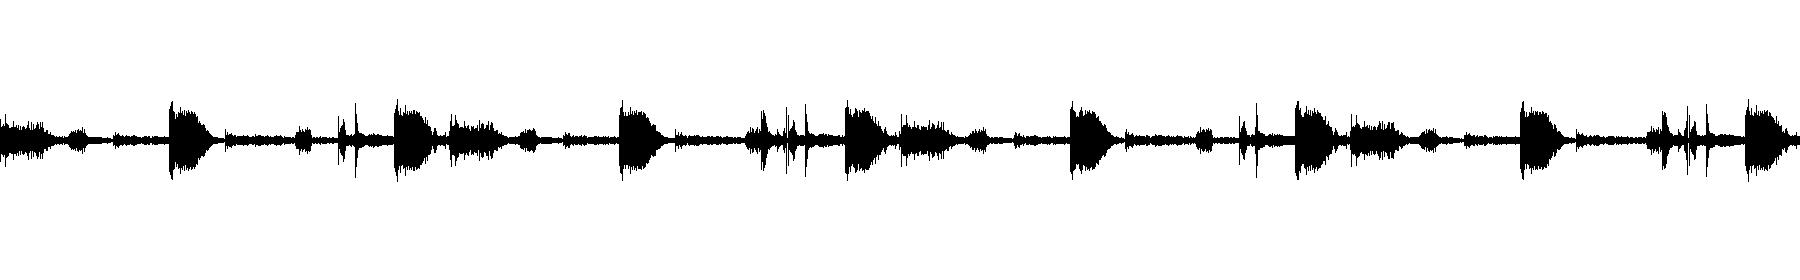 mf rdtf 08 percussion loops 125bpm